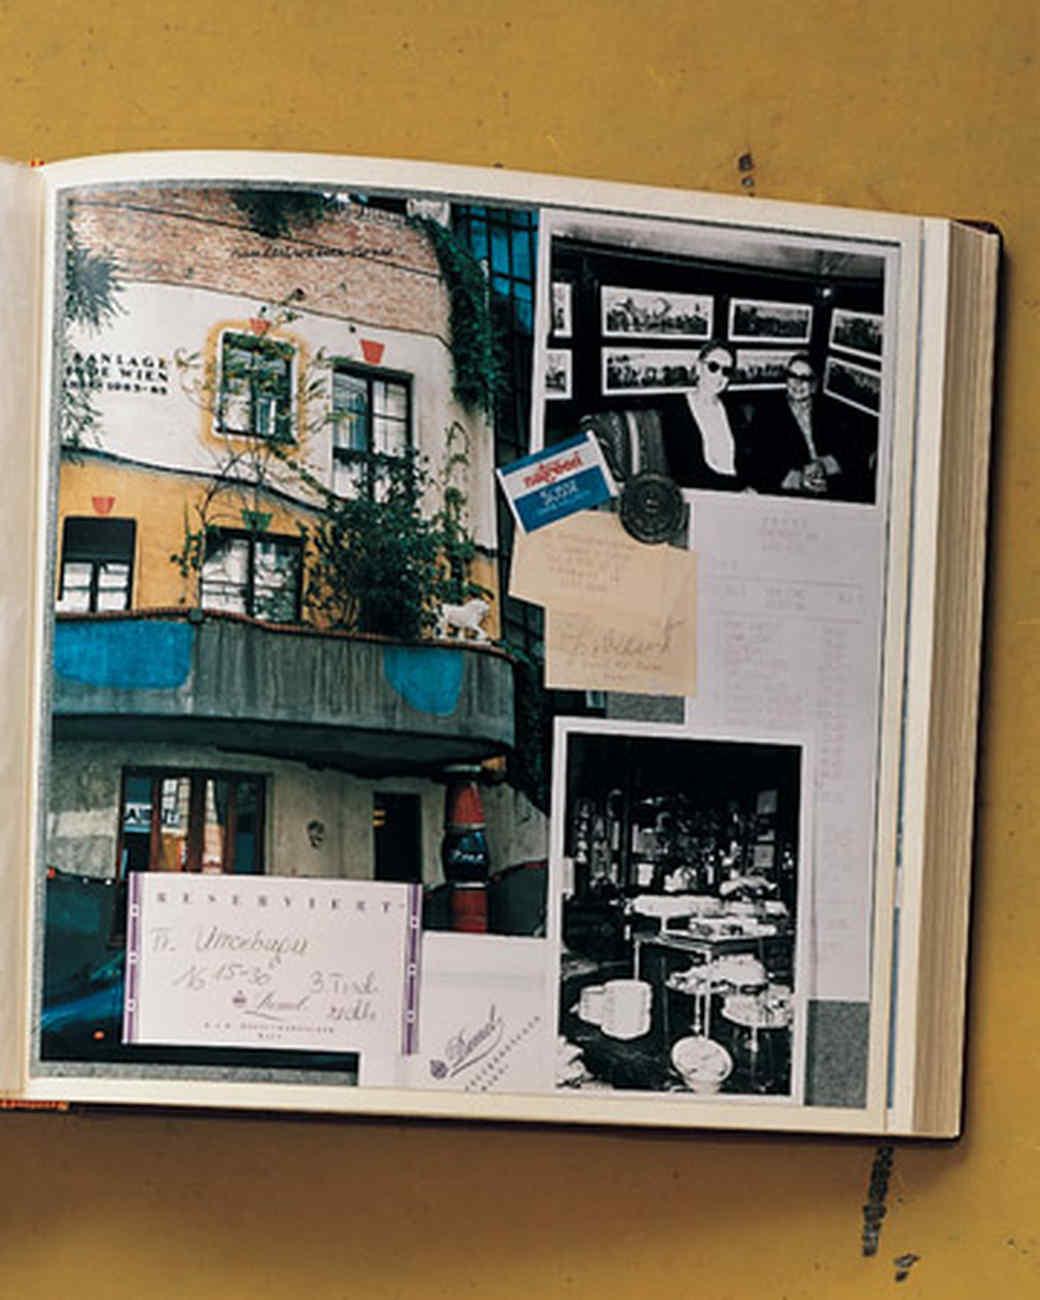 ml809_0998_scrapbook_v15.jpg